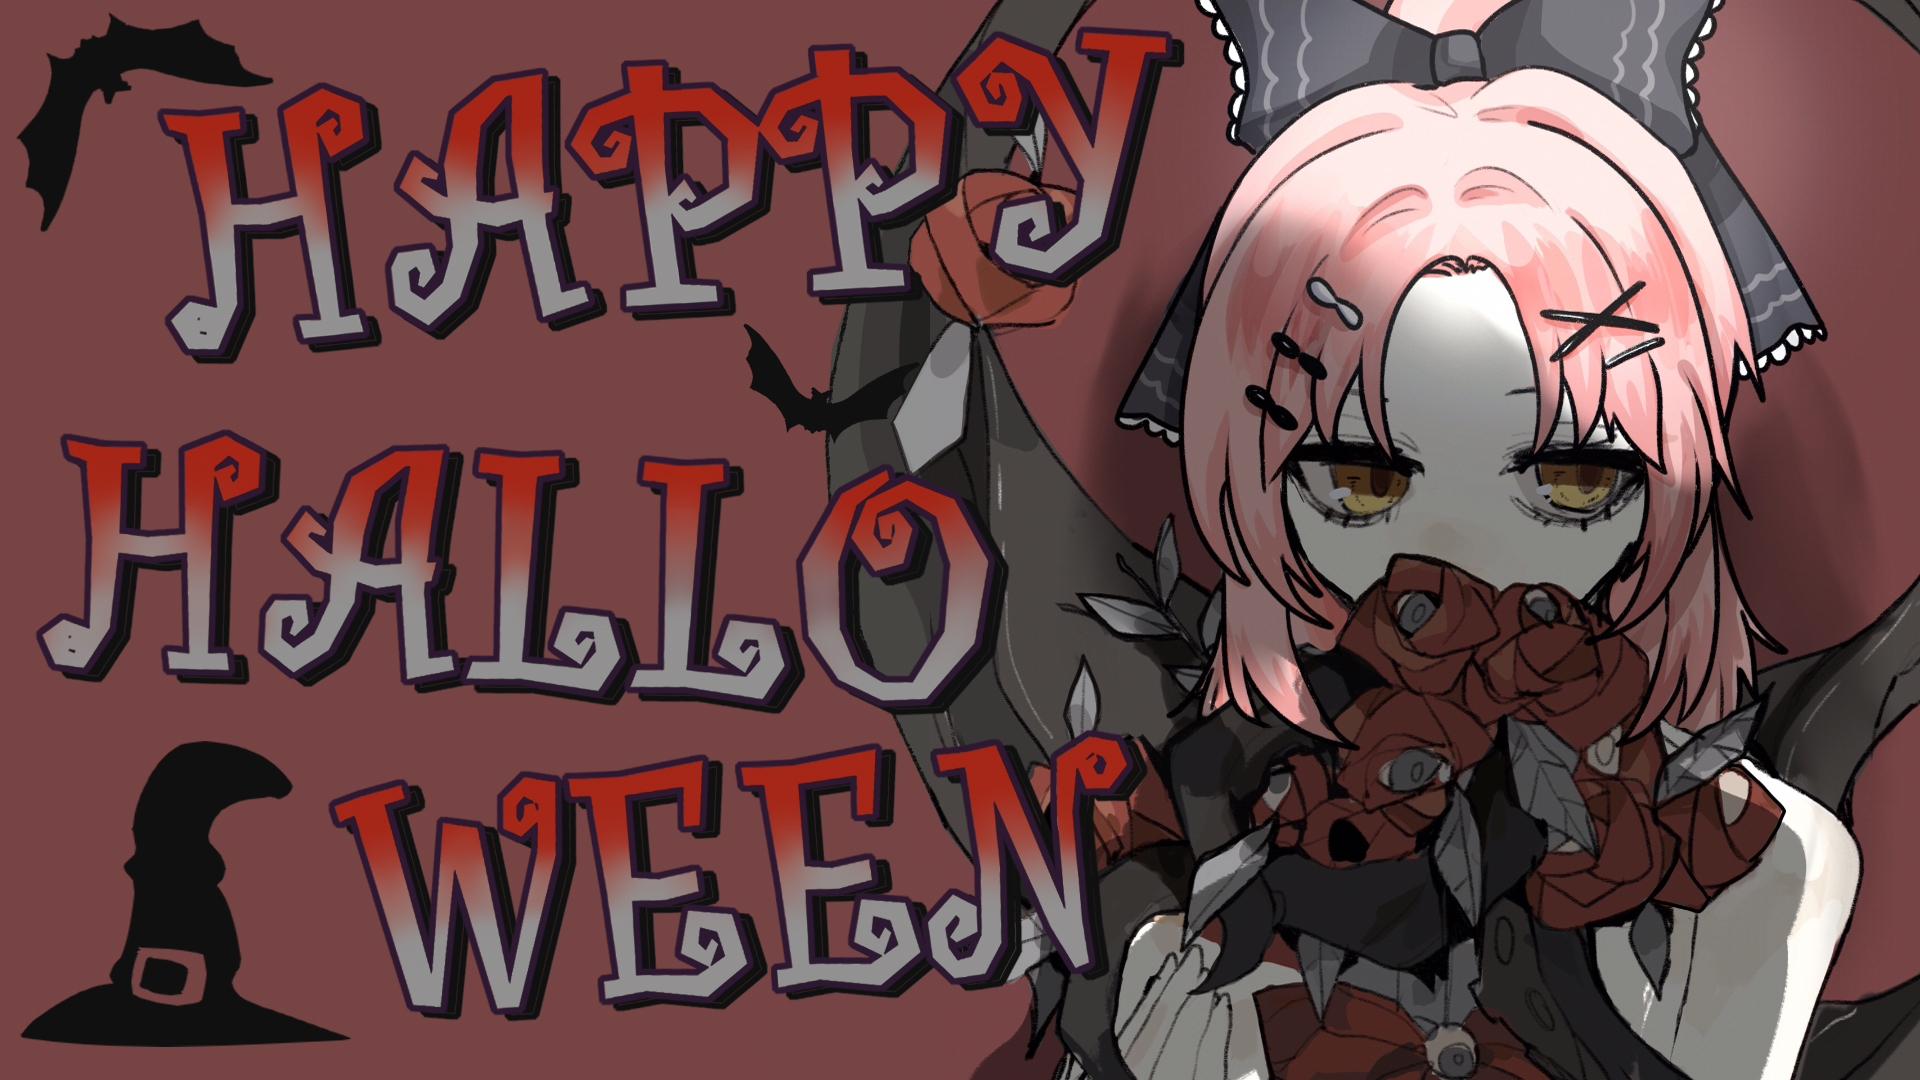 【VUP万圣祭】◇happy halloween◇不给糖果就捣蛋!